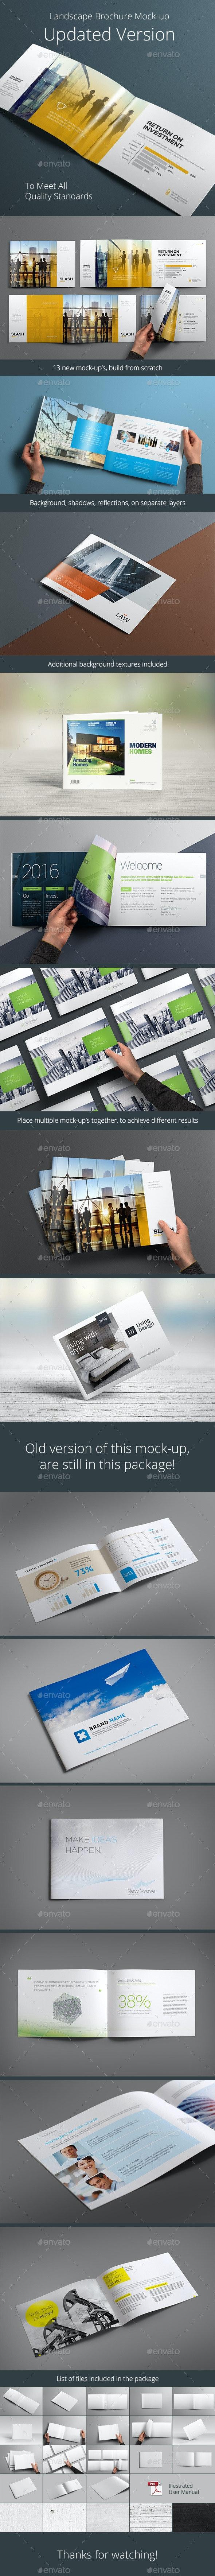 Horizontal Brochure Mock-up - Brochures Print